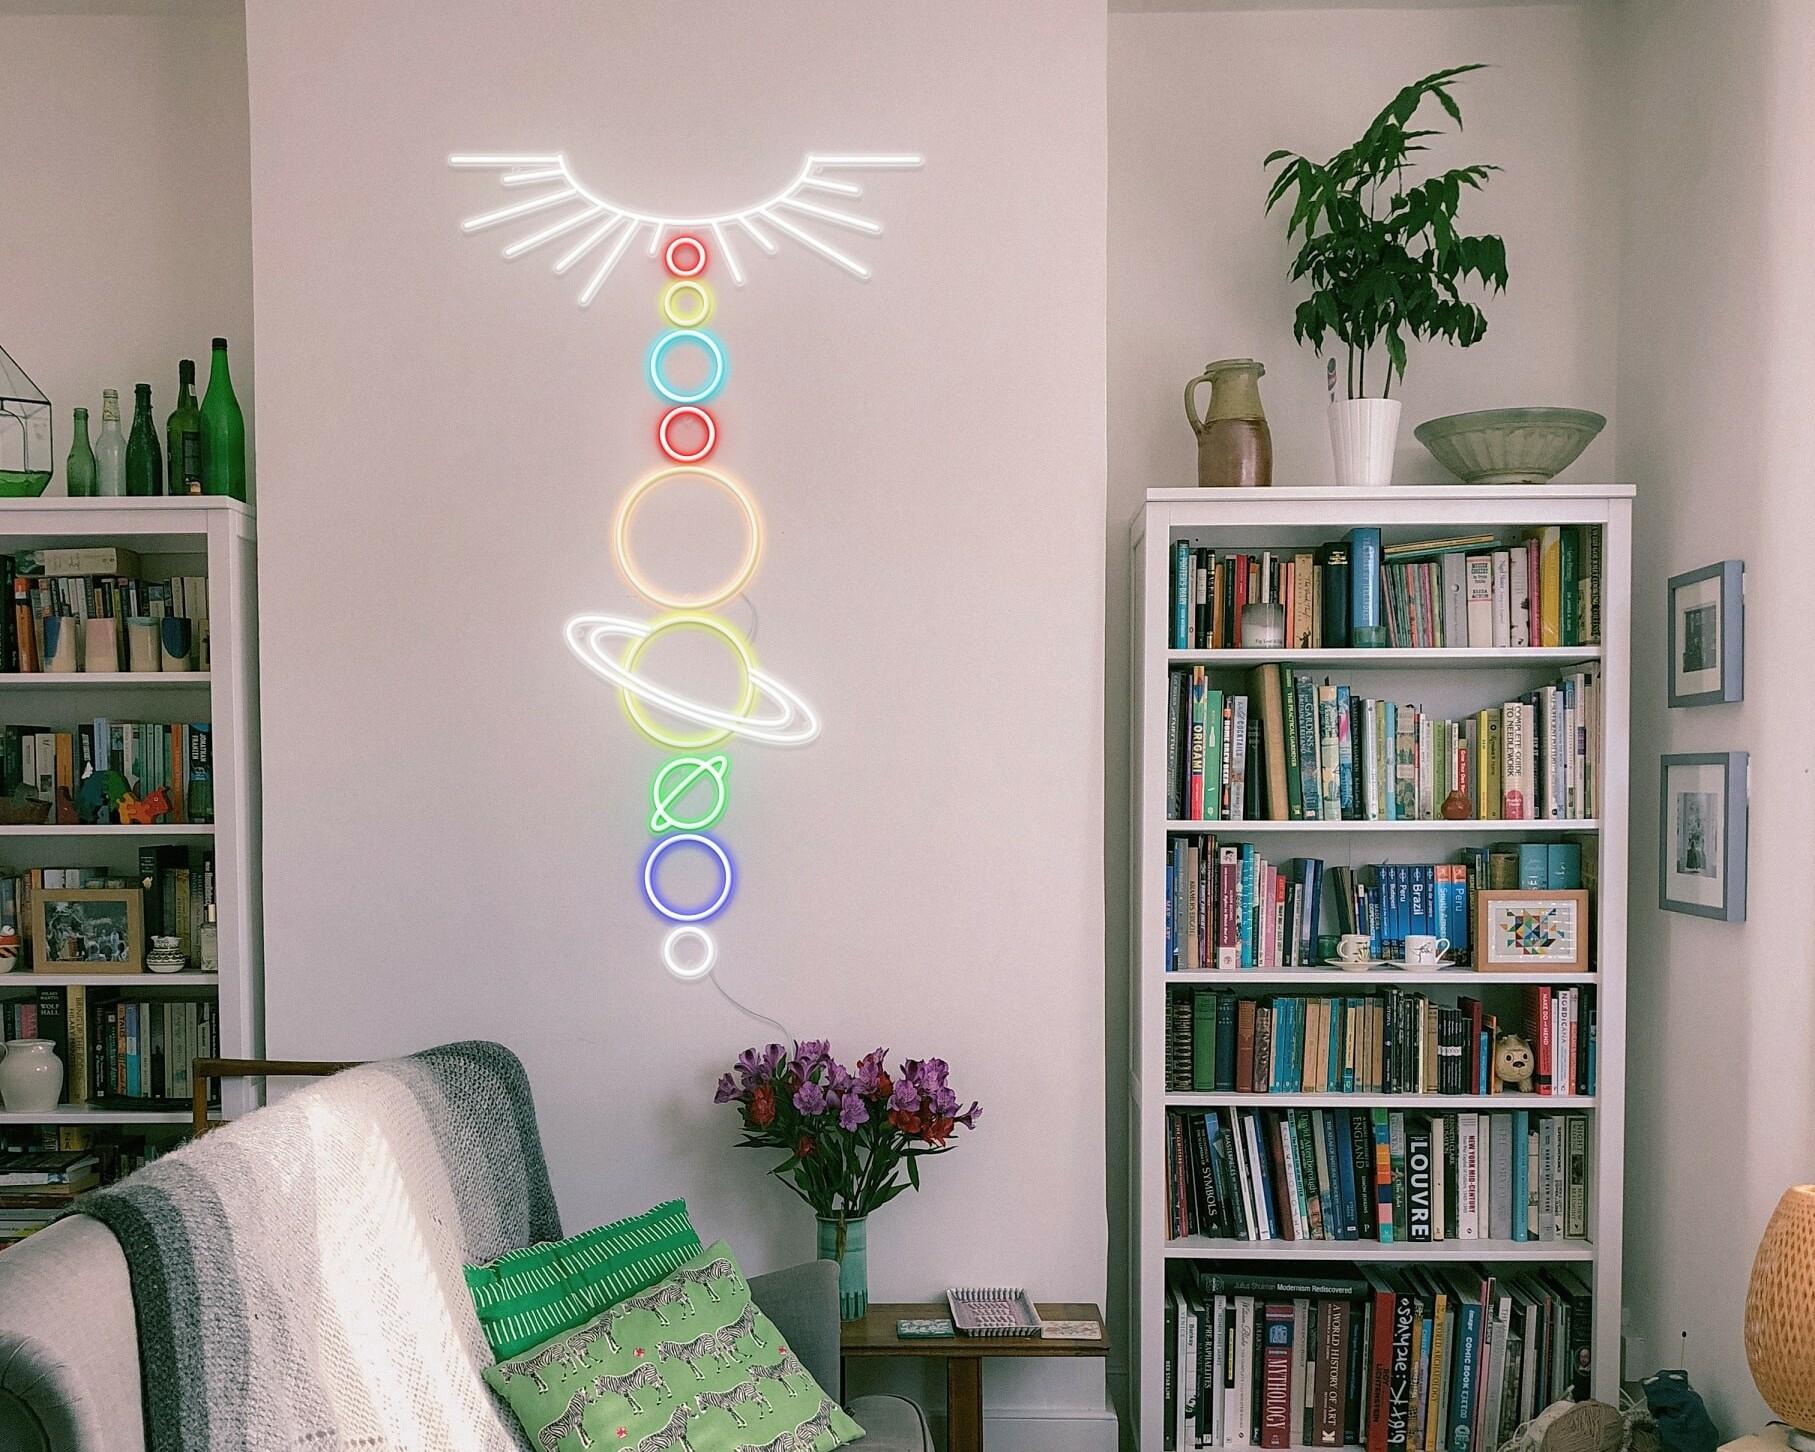 solar system neon sign